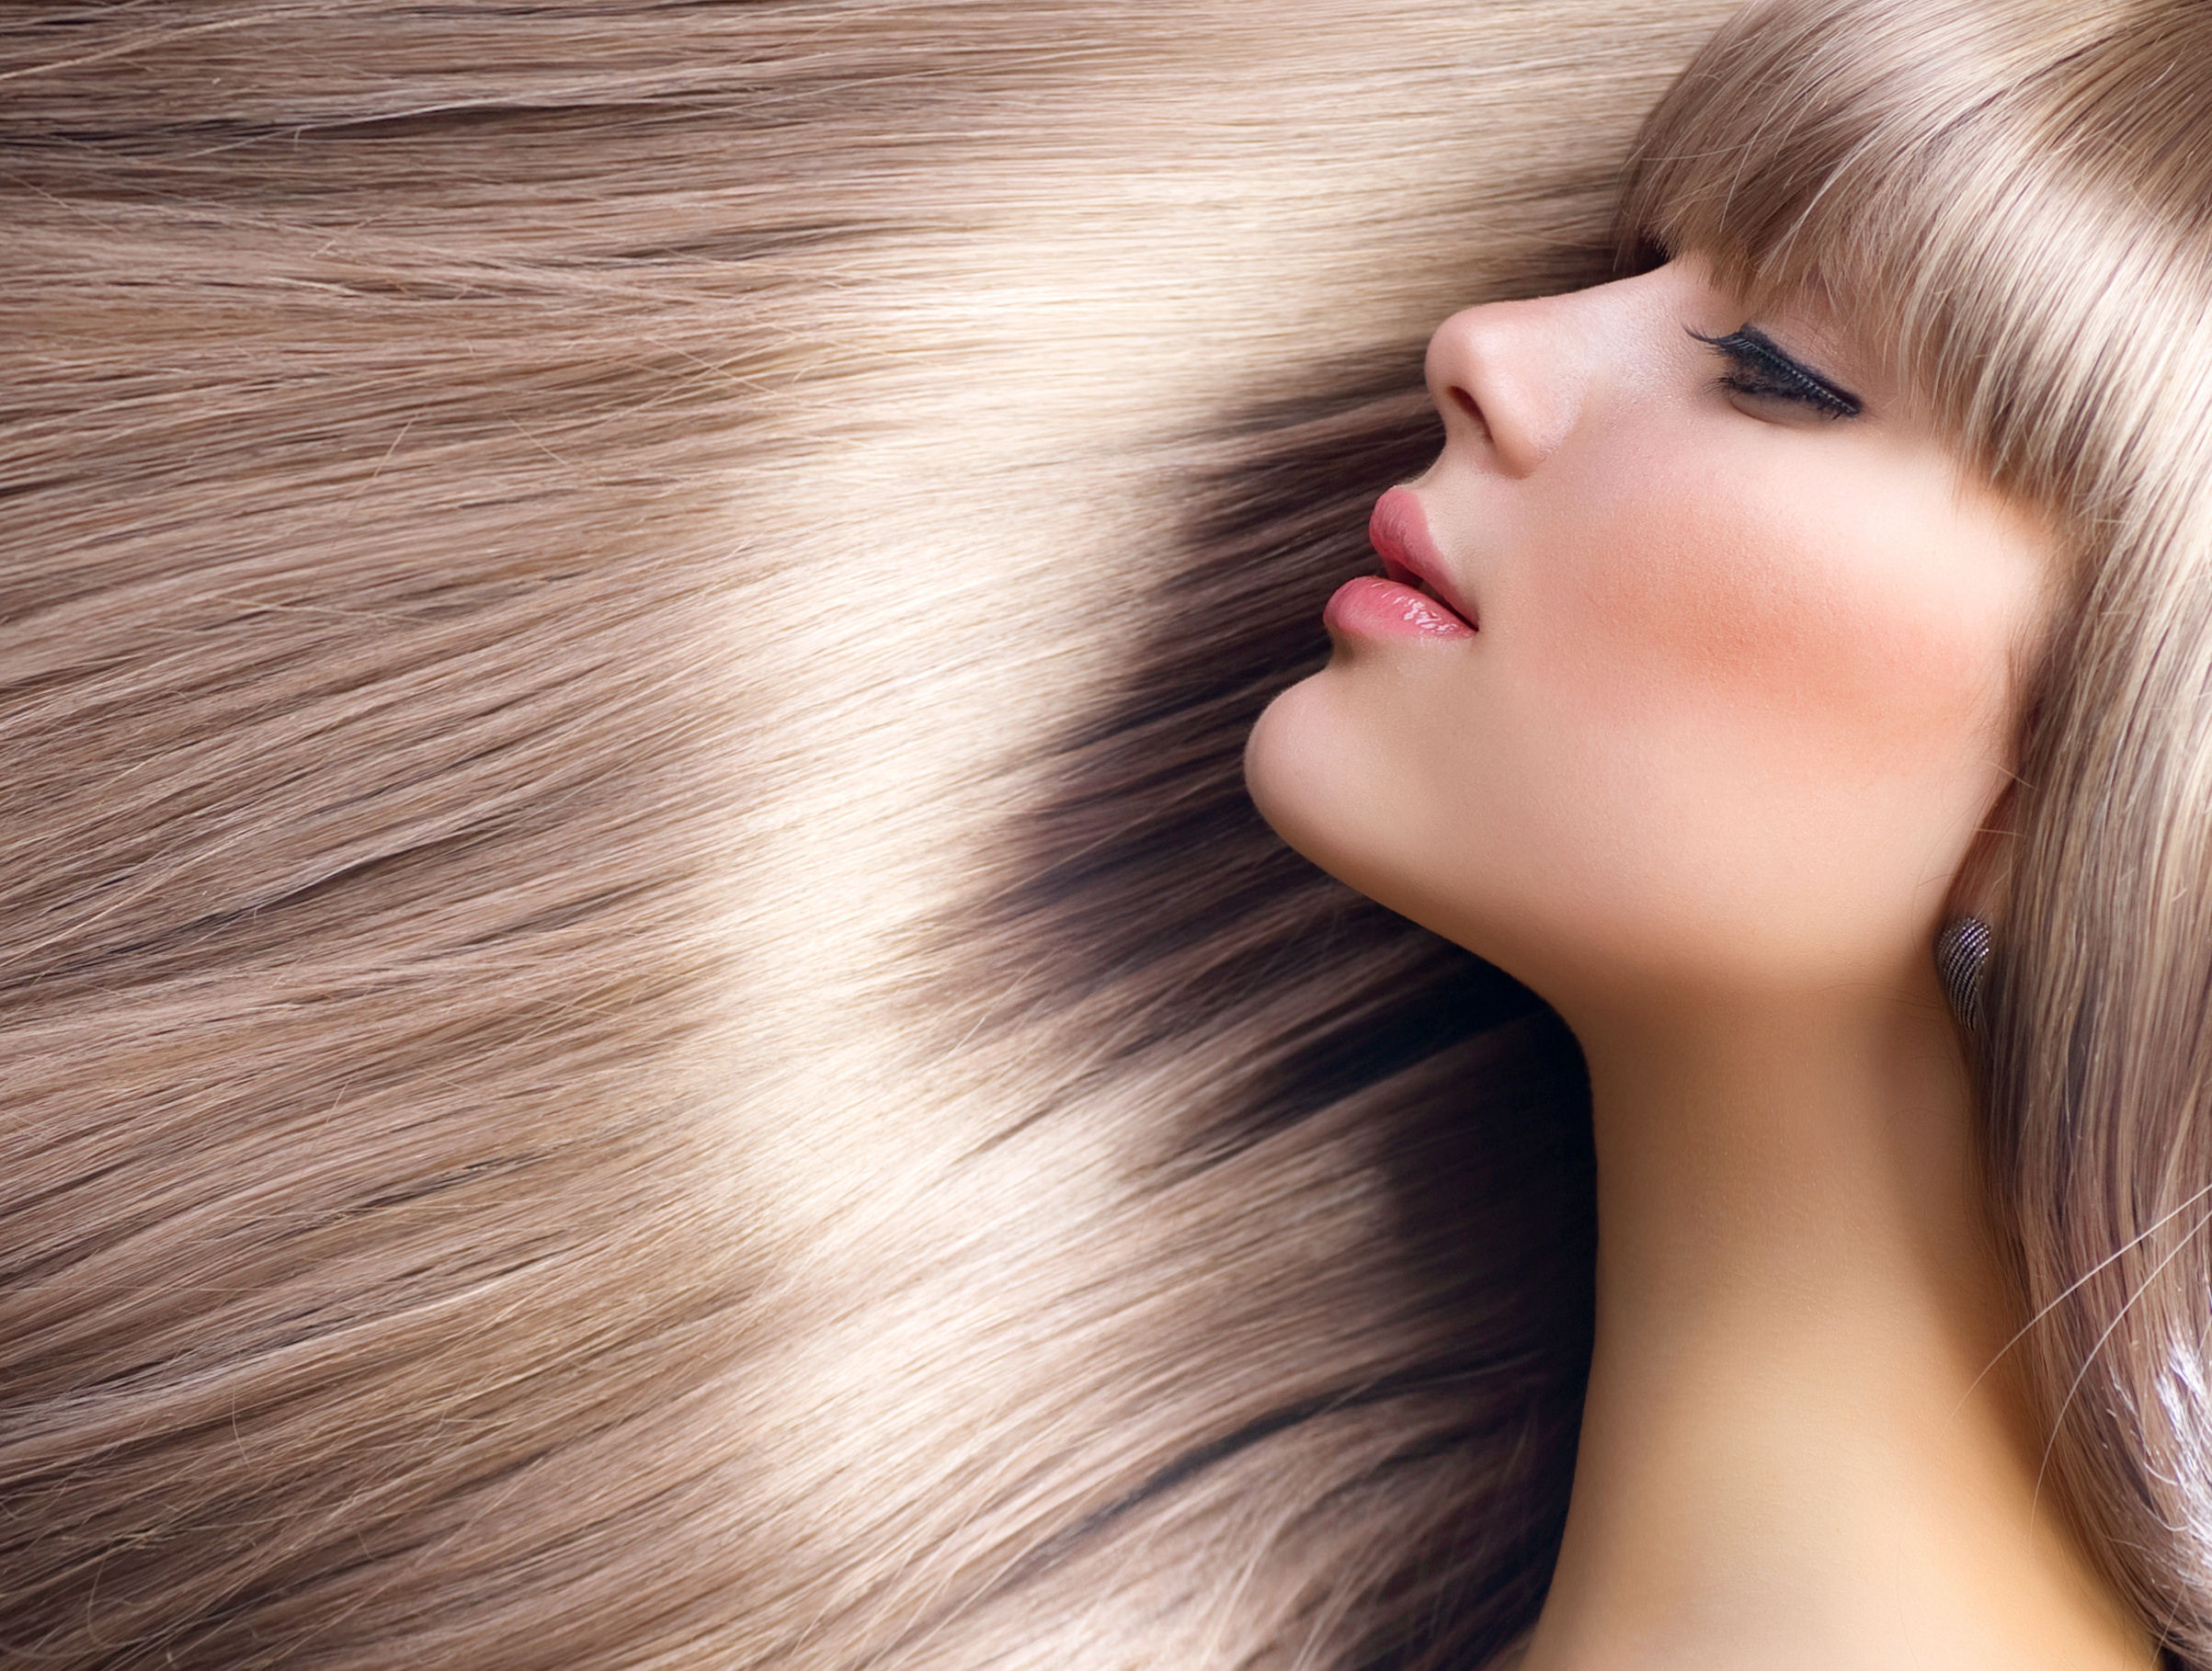 28 Albums Of Hd Hair - Palette Rose Blonde Hair Color - HD Wallpaper